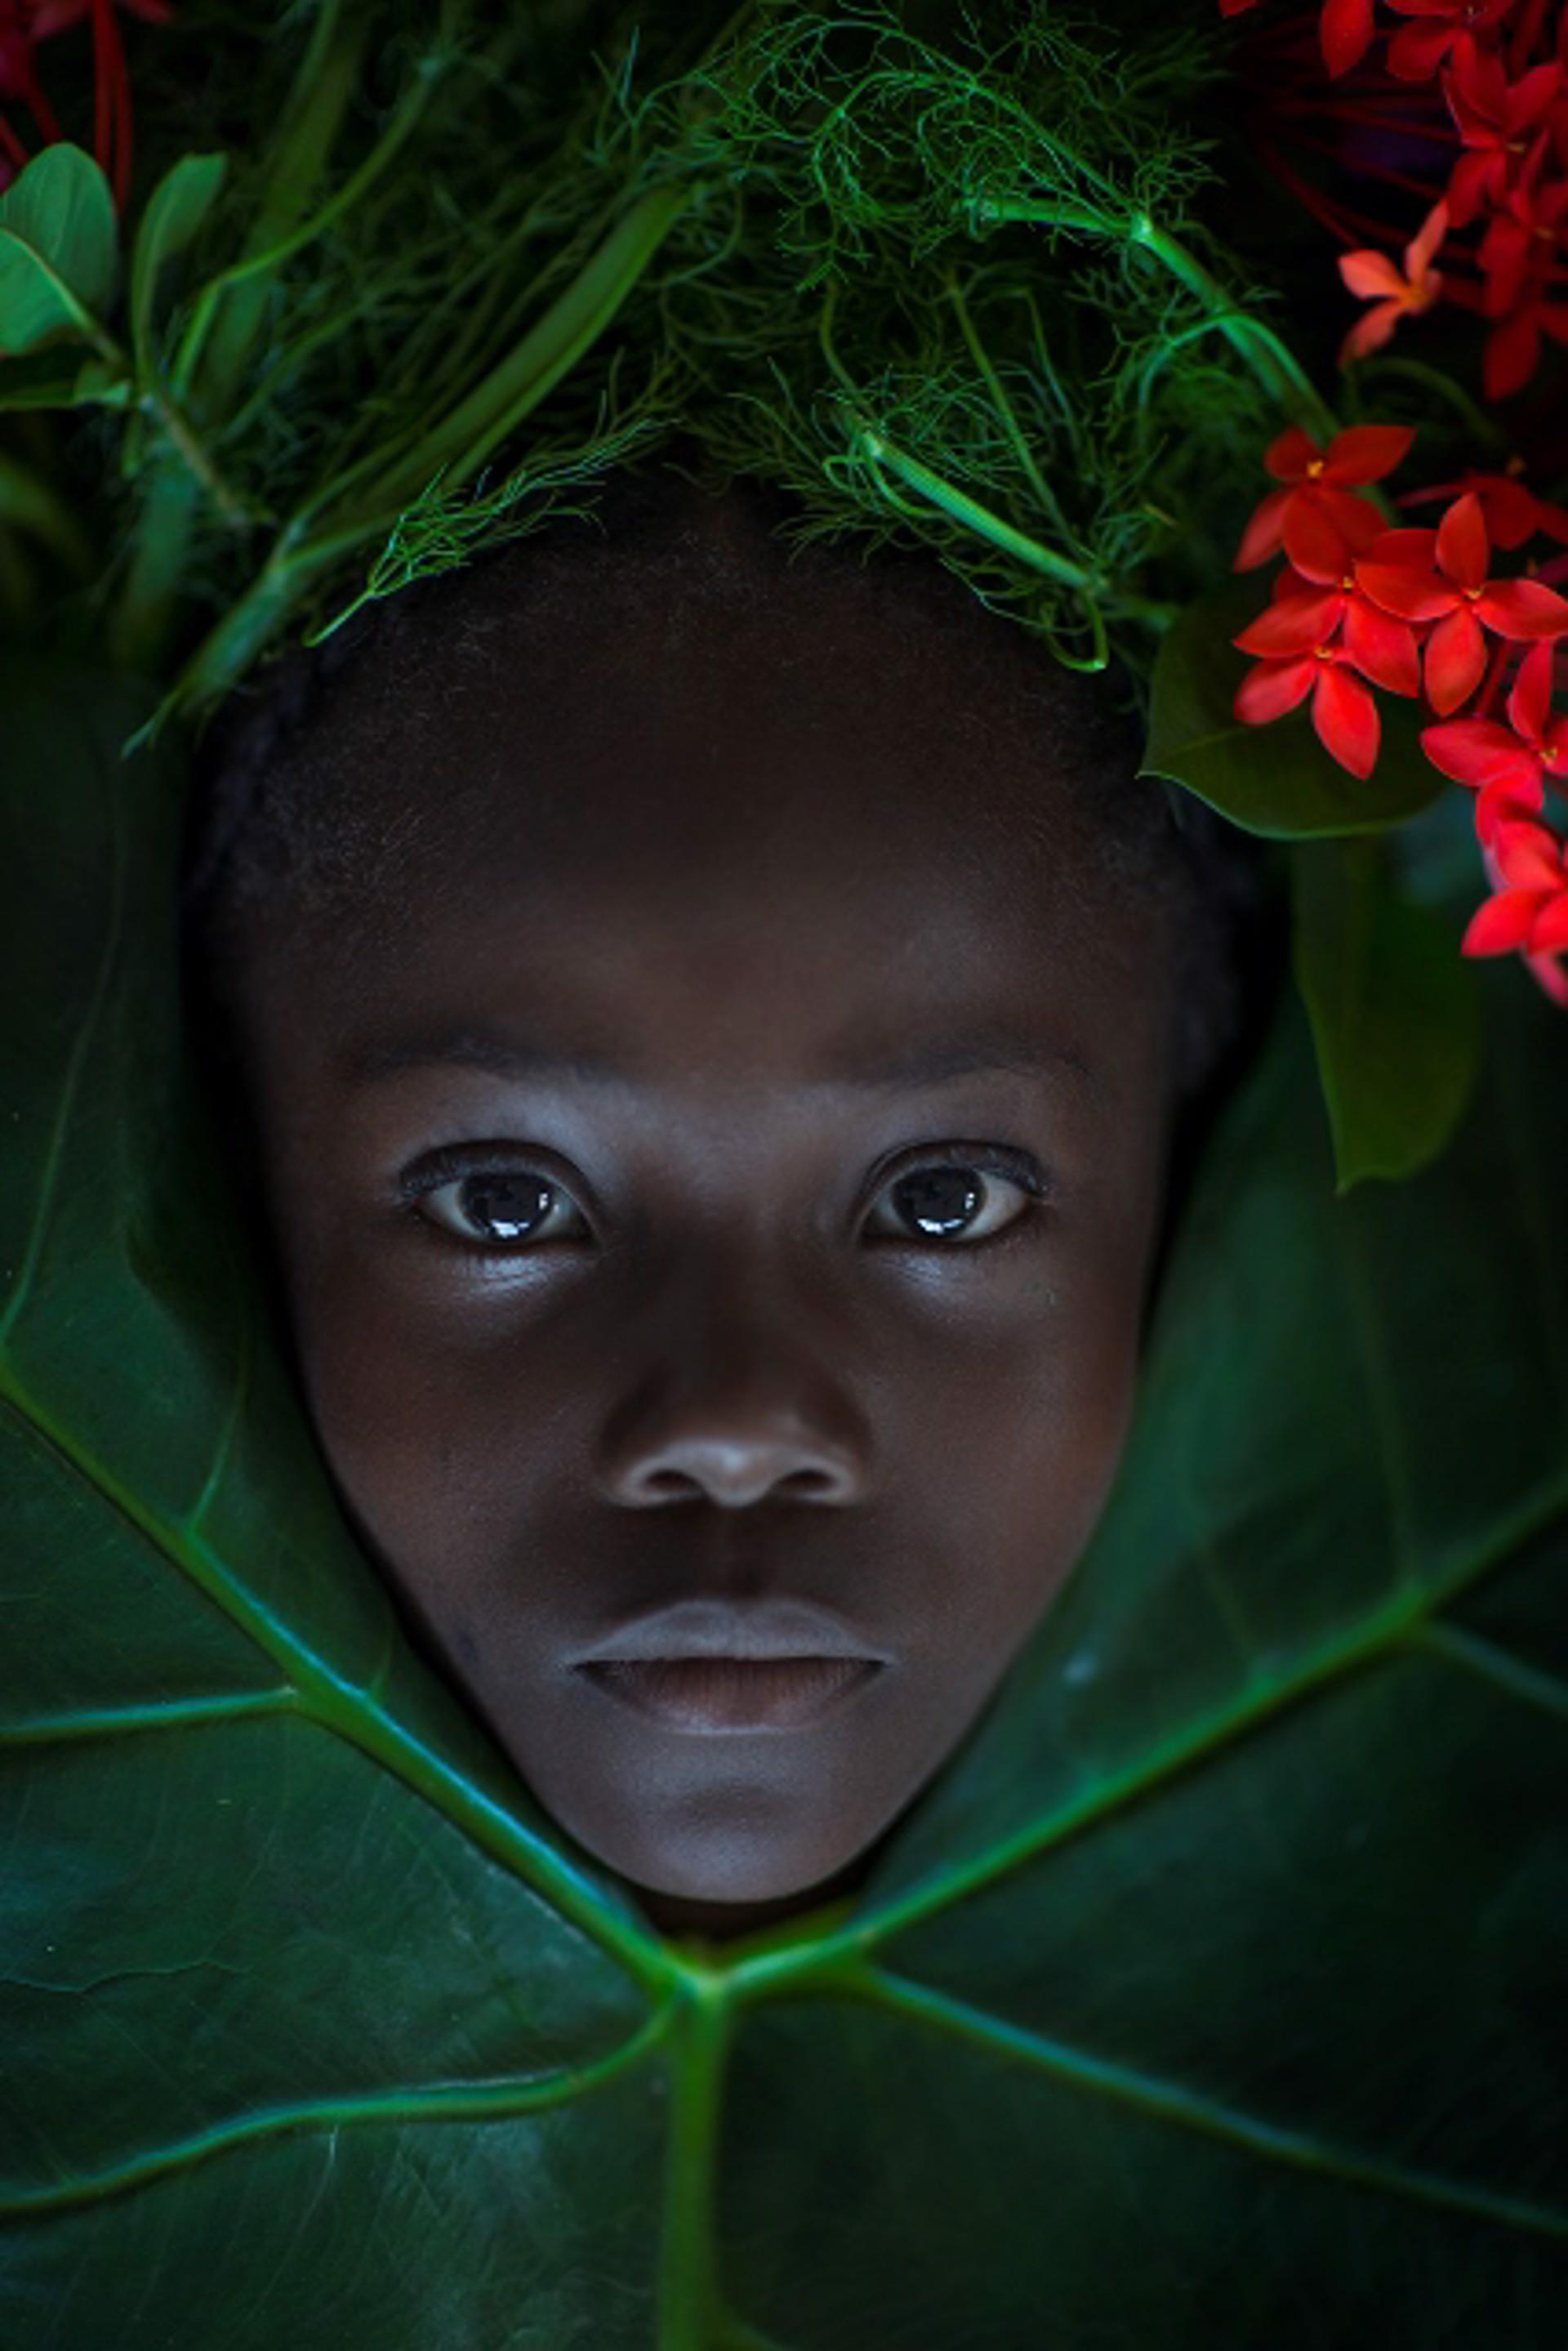 No. 025 by Stephon Senegal